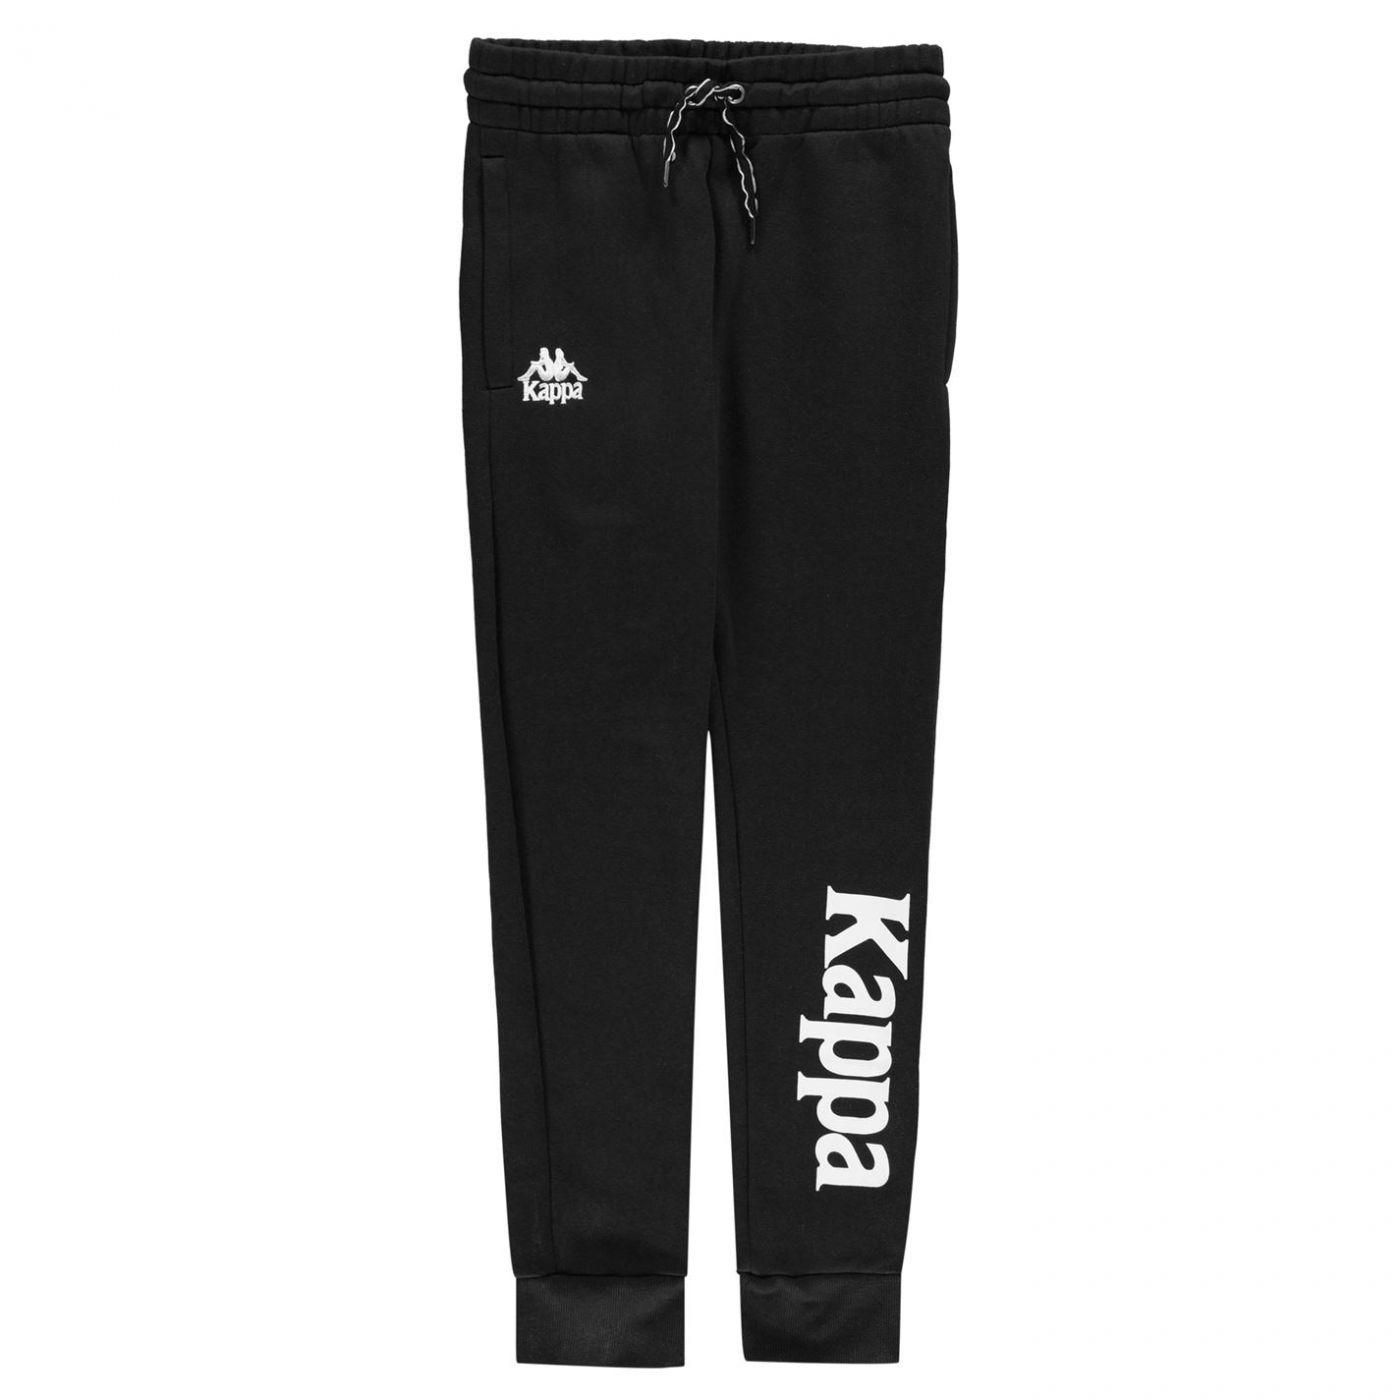 Kappa Paceco Jogging Pants Mens